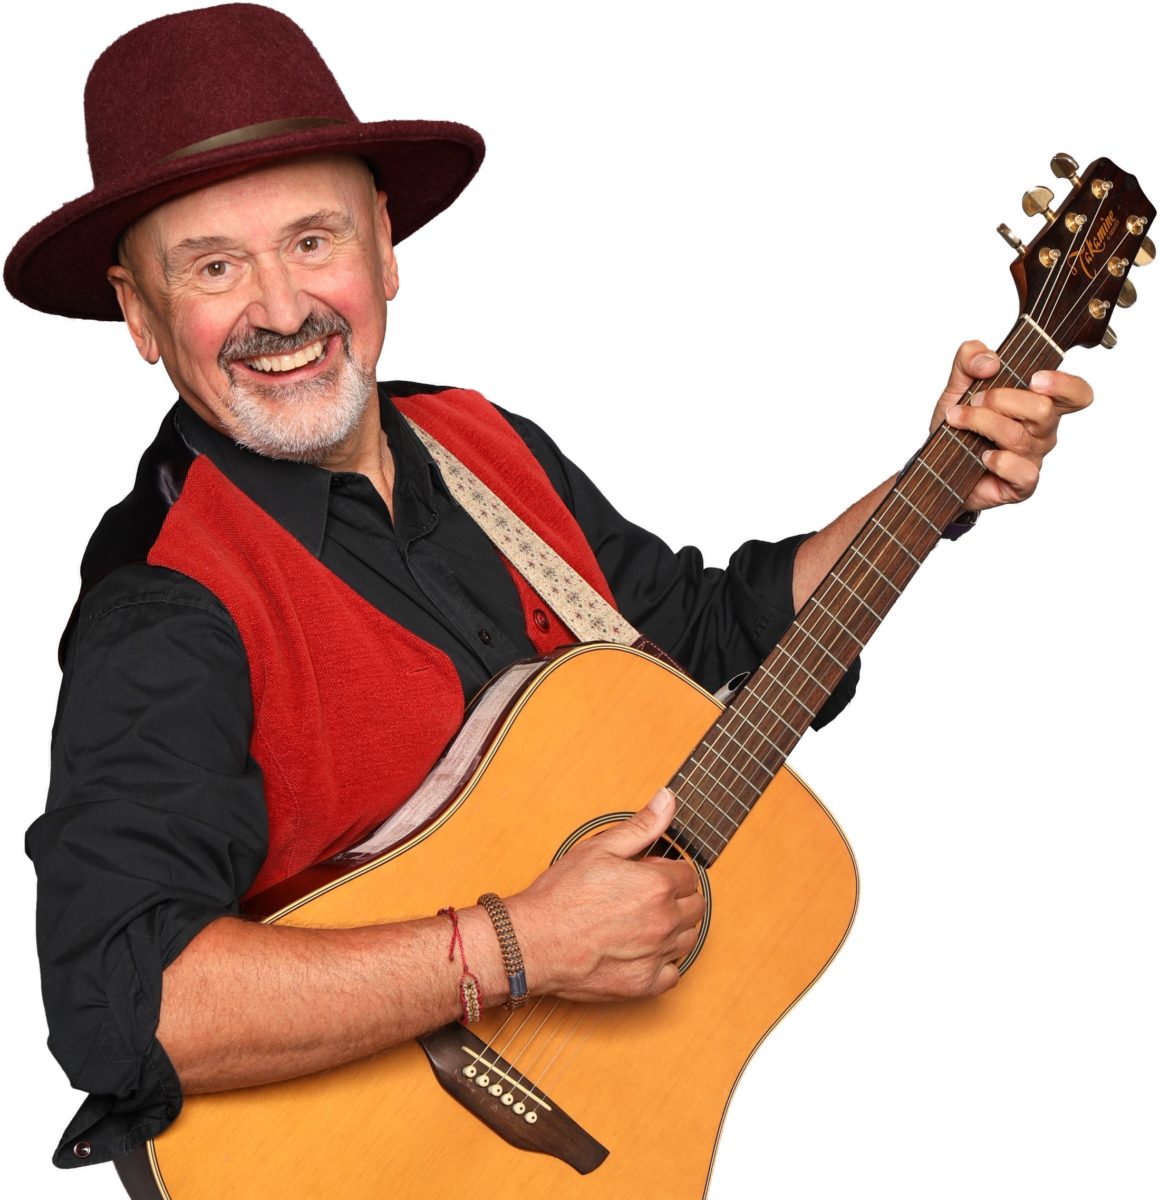 Troubadour Rob Krot